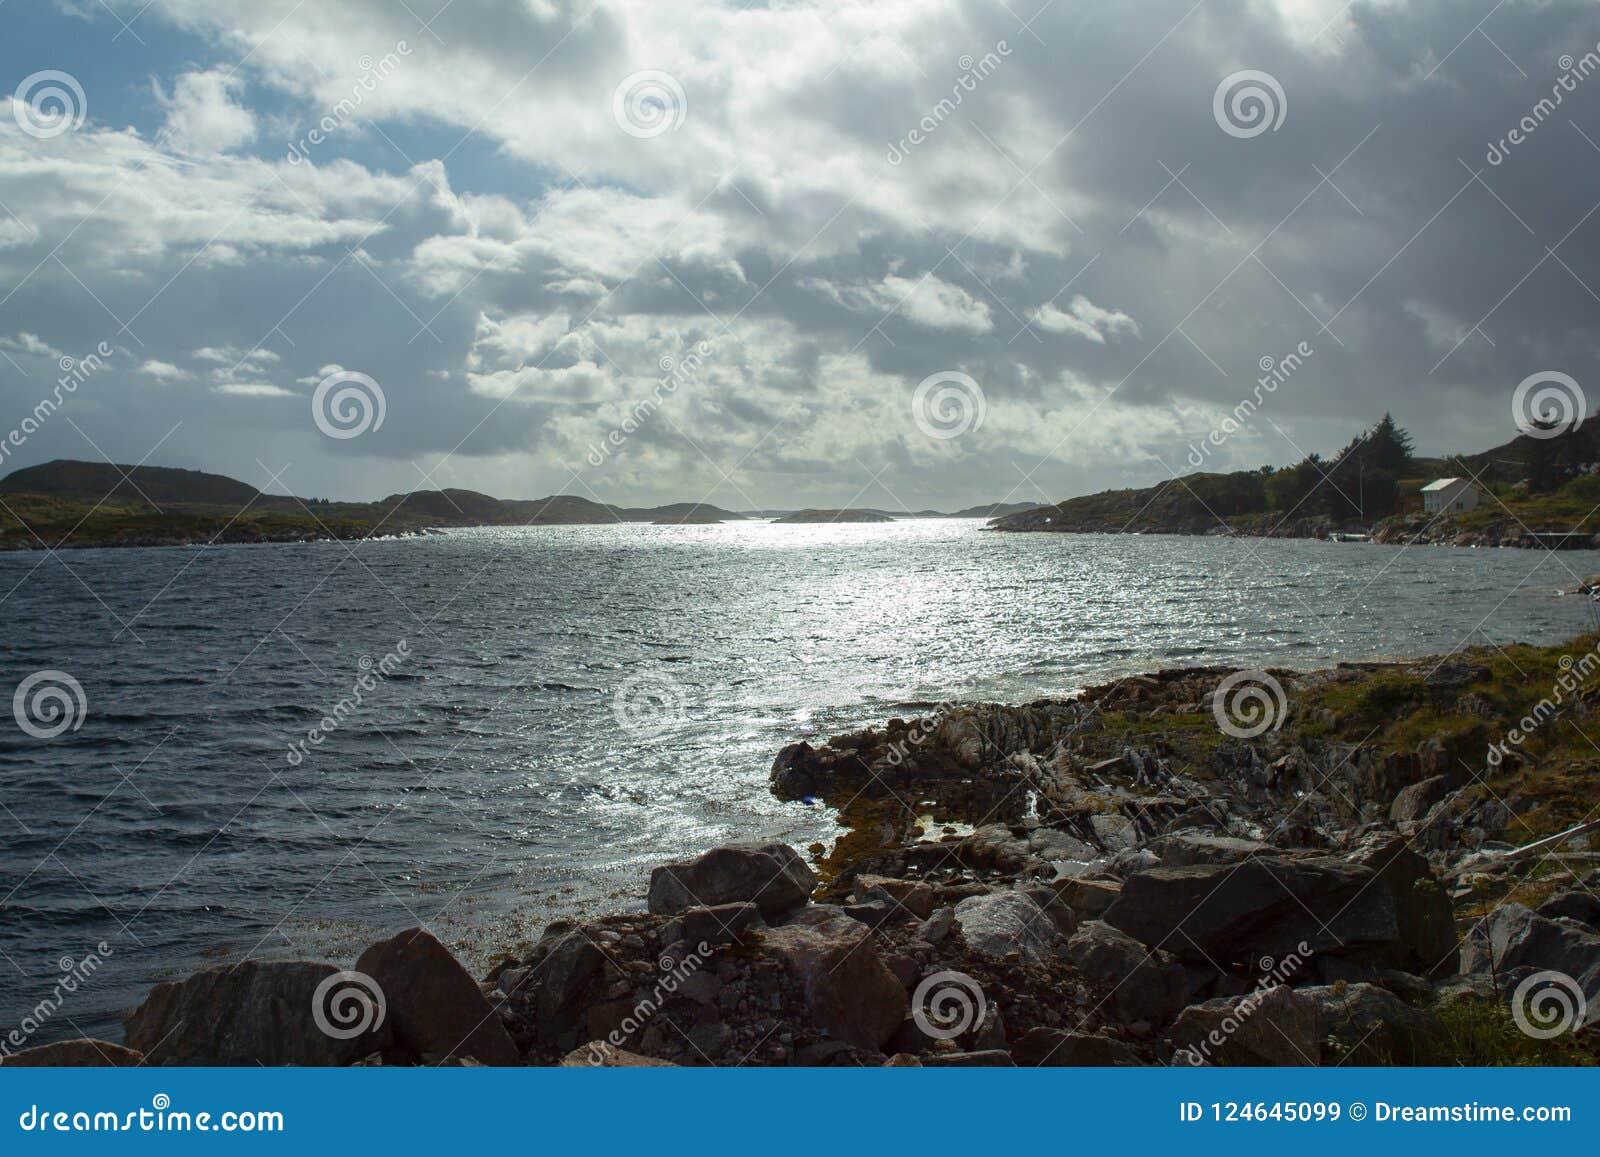 Mar calmo em Frøya - Noruega